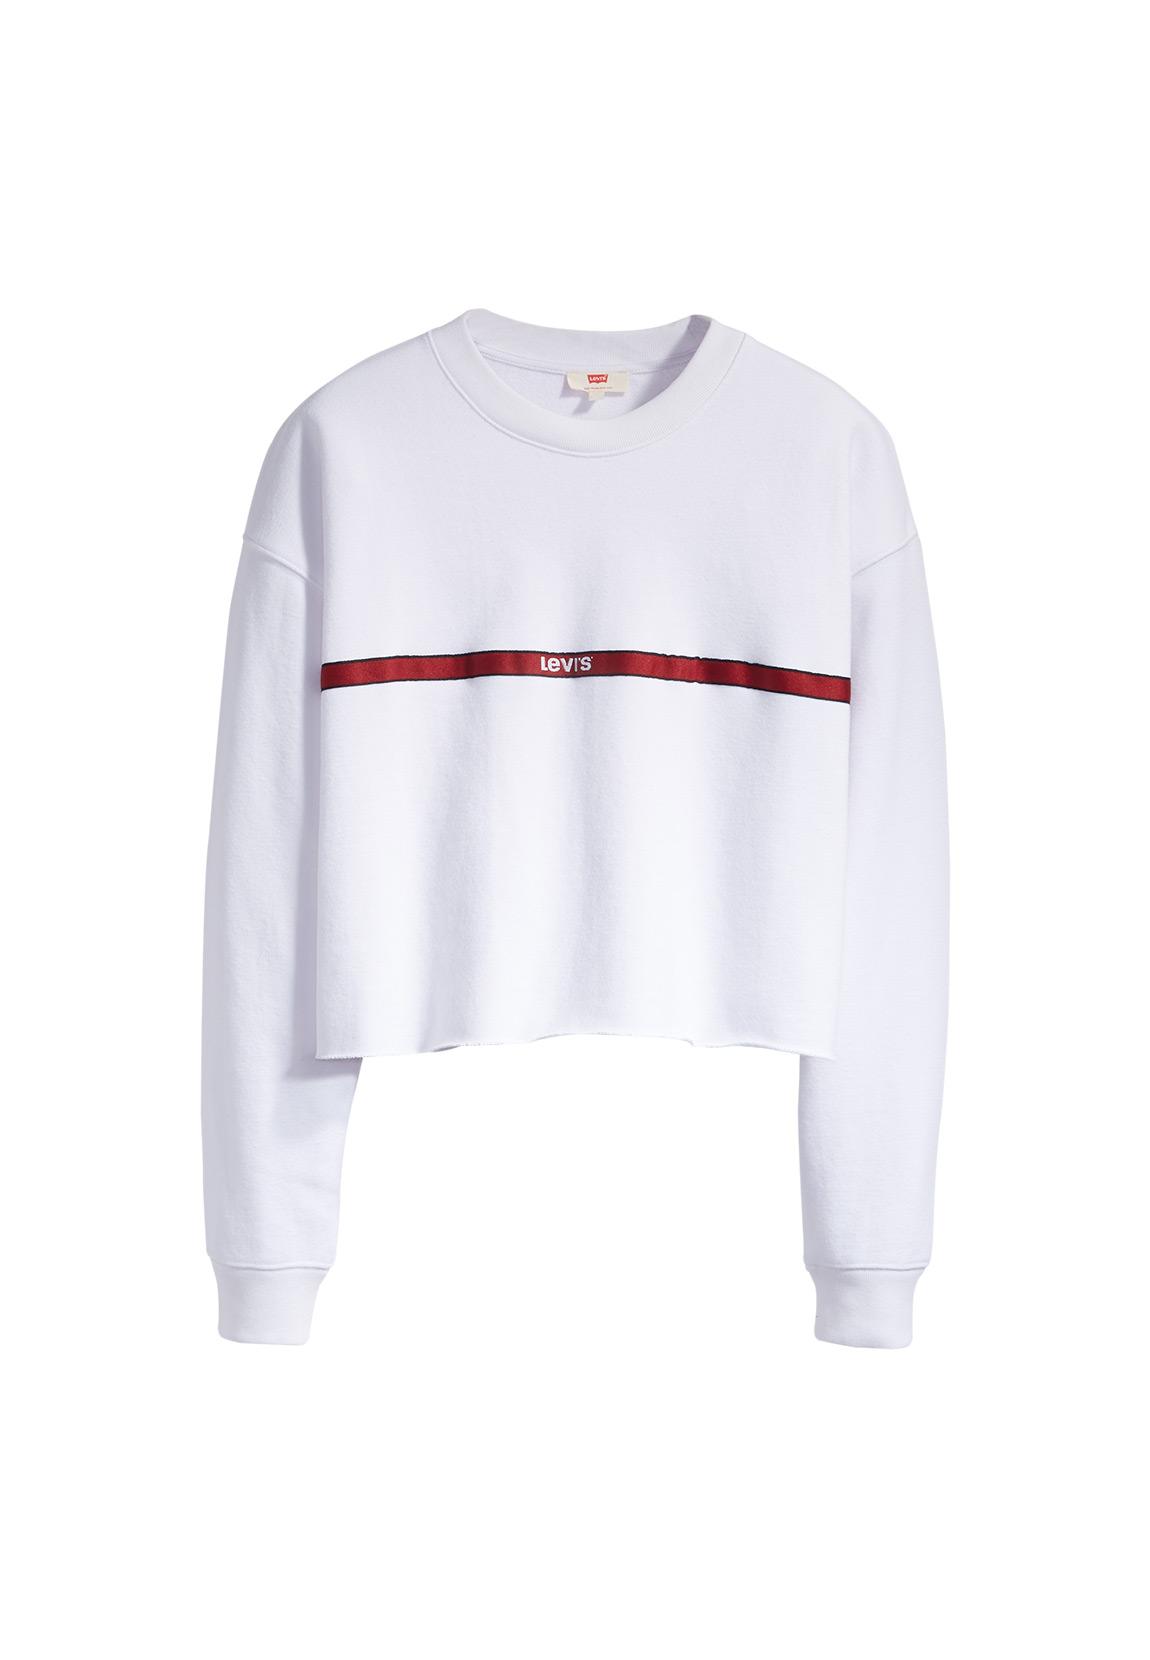 Details about Levis Women's Sweatshirt Graphic Raw Cut Crew 56340 0011 White